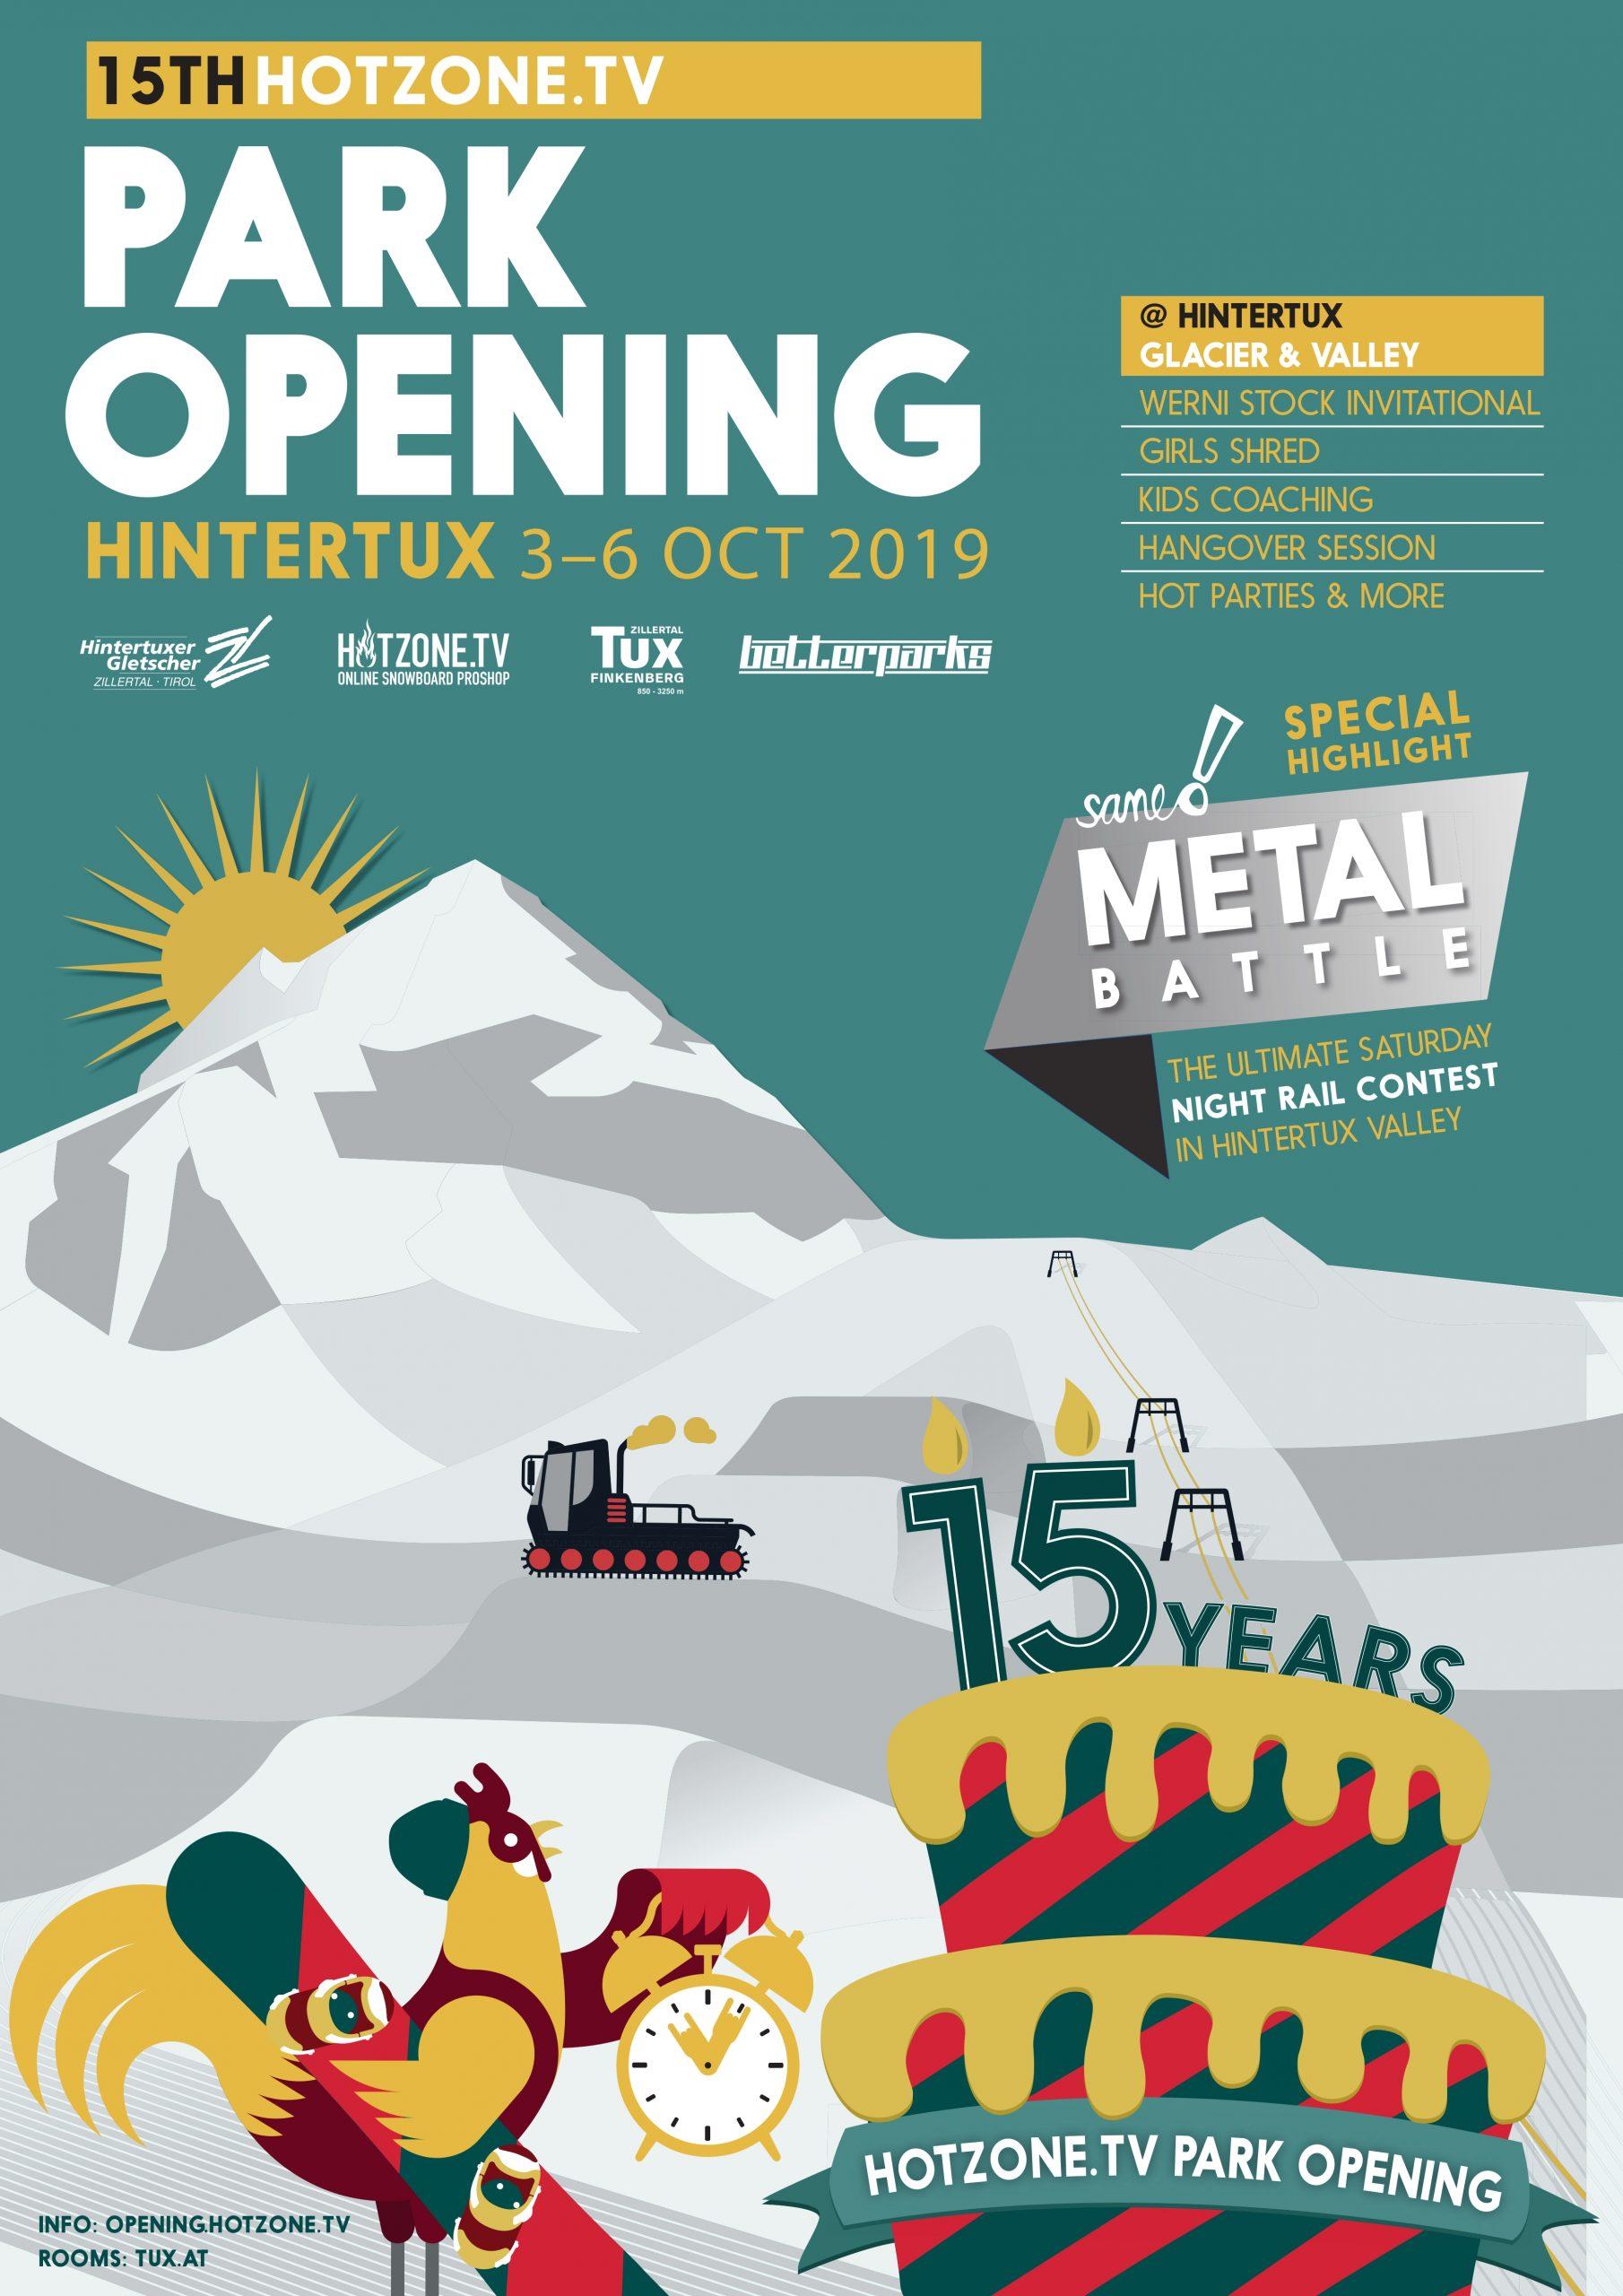 Hotzone tv Park Opening Betterpark Hintertux Austria Werni Stock Invitational Metal Battle 15th Anniversary